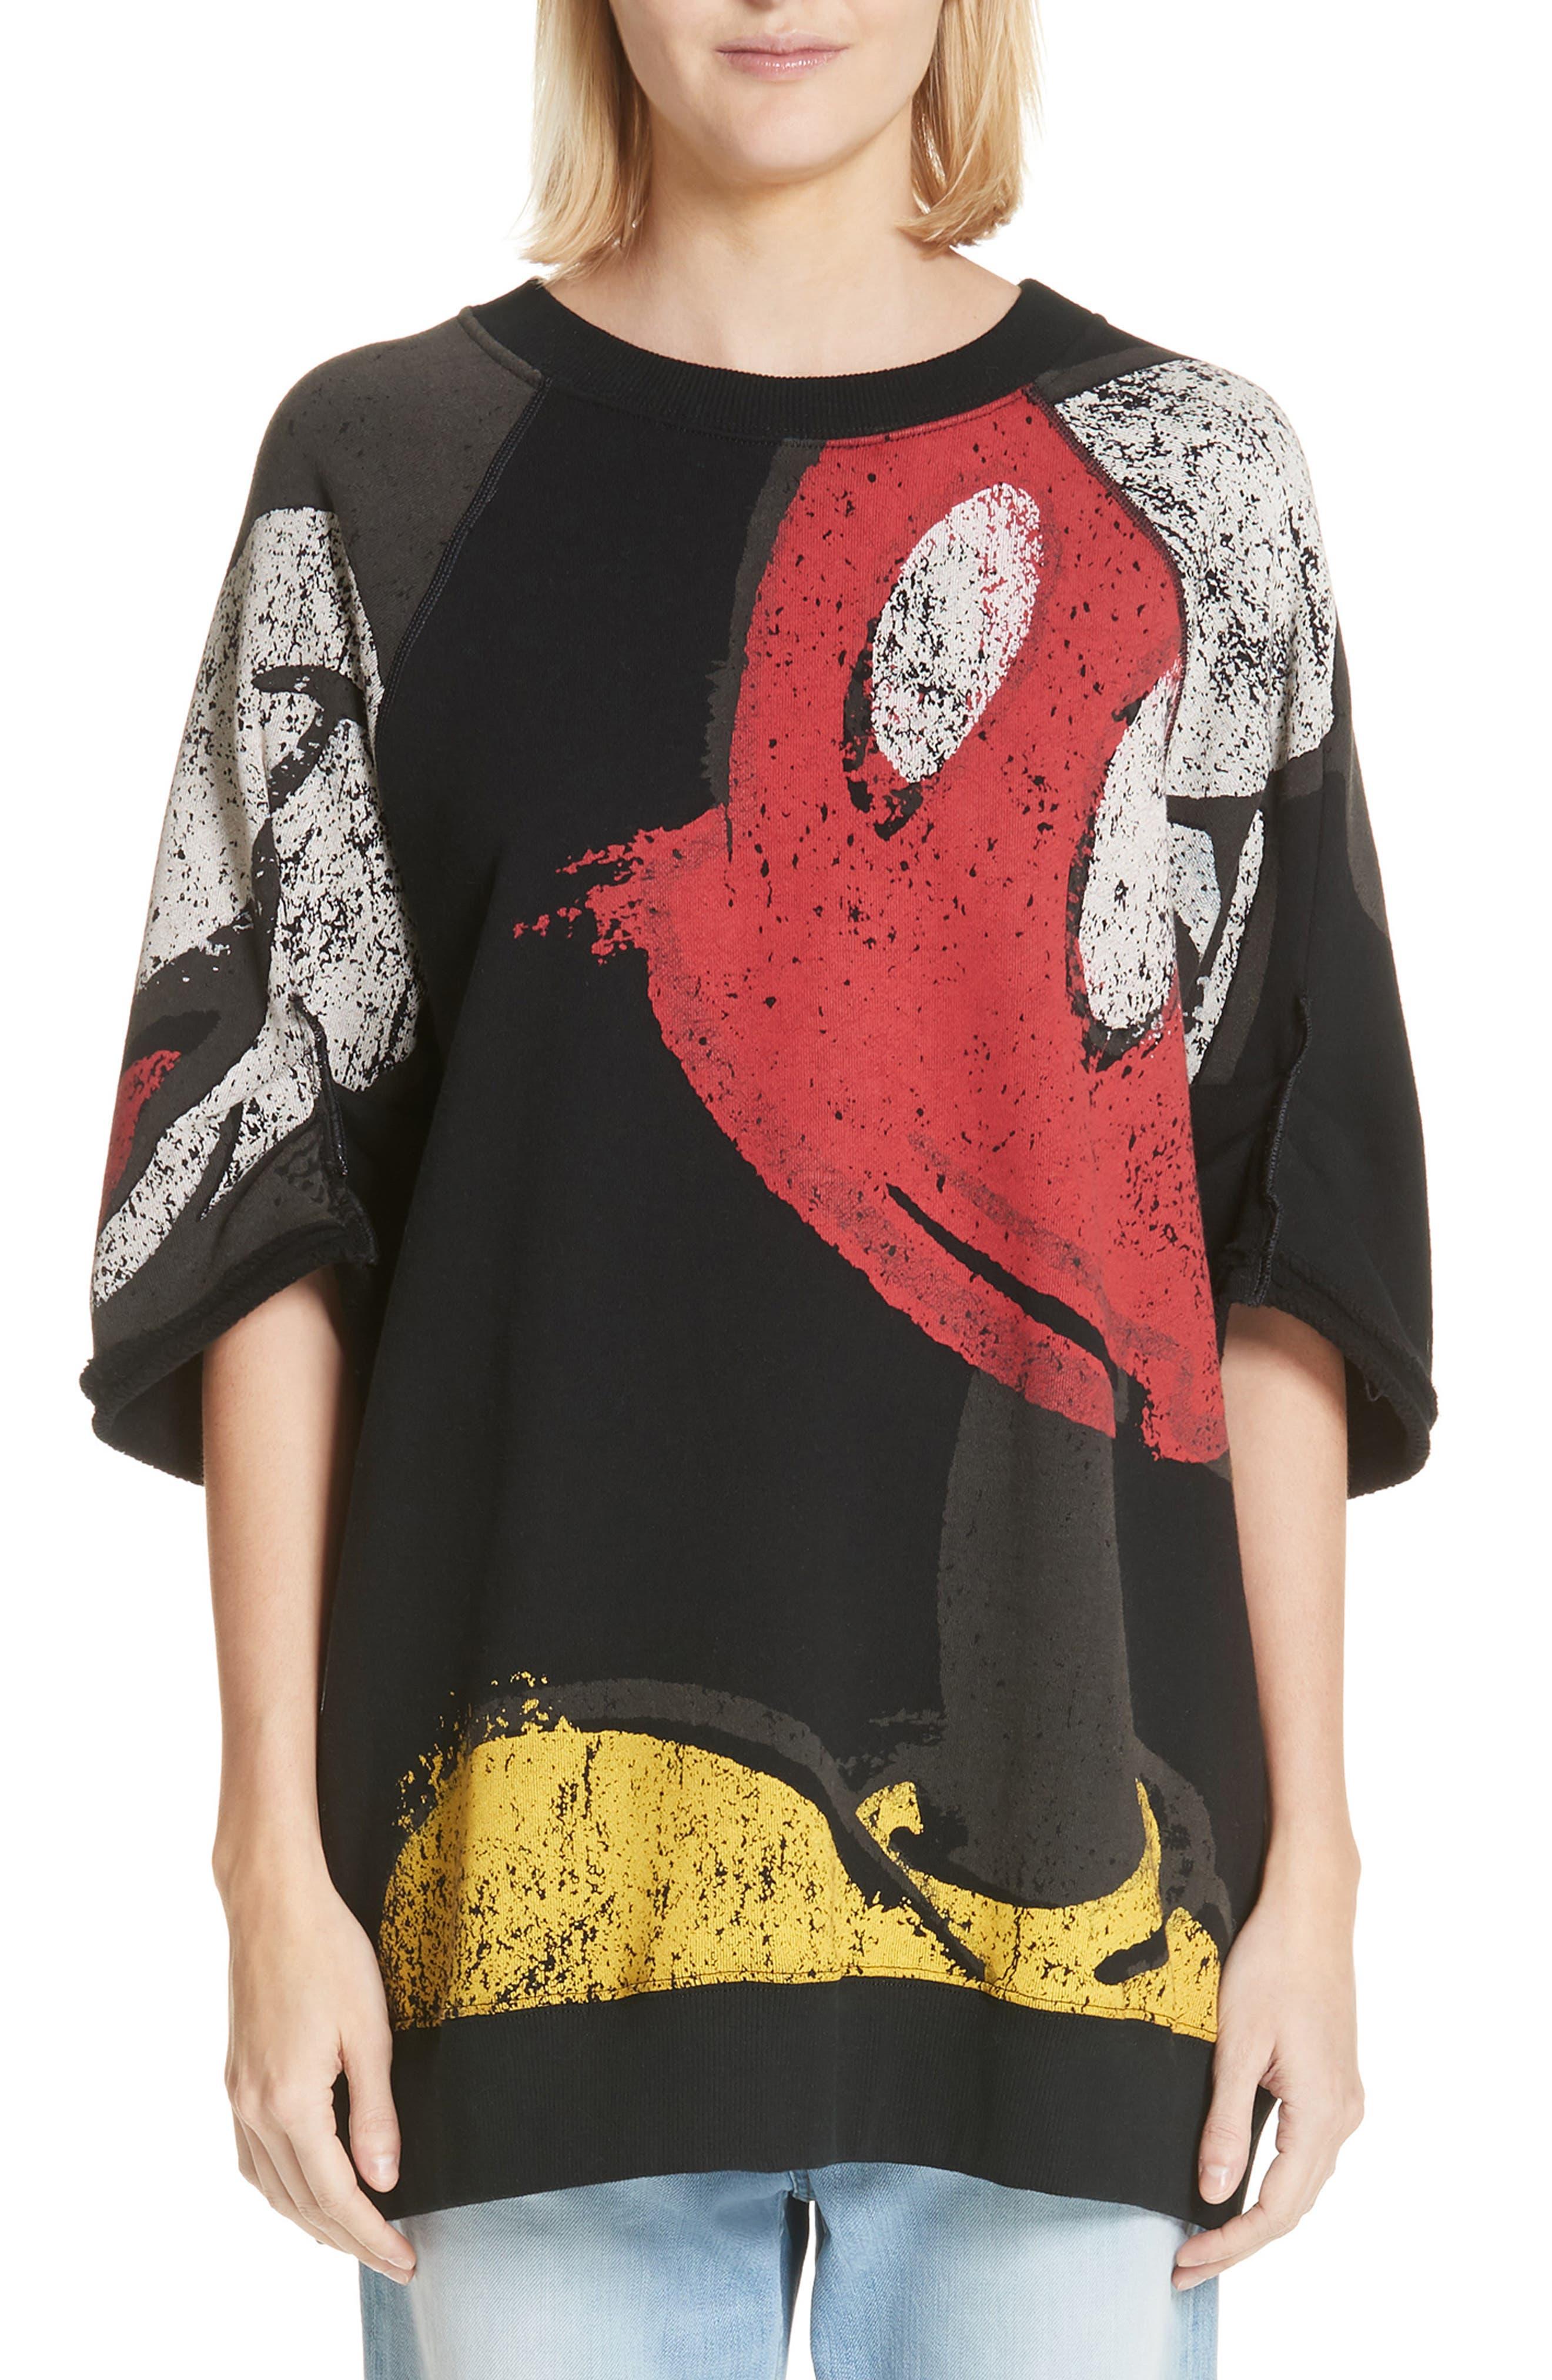 Mickey Mouse Short Sleeve Sweatshirt in Black